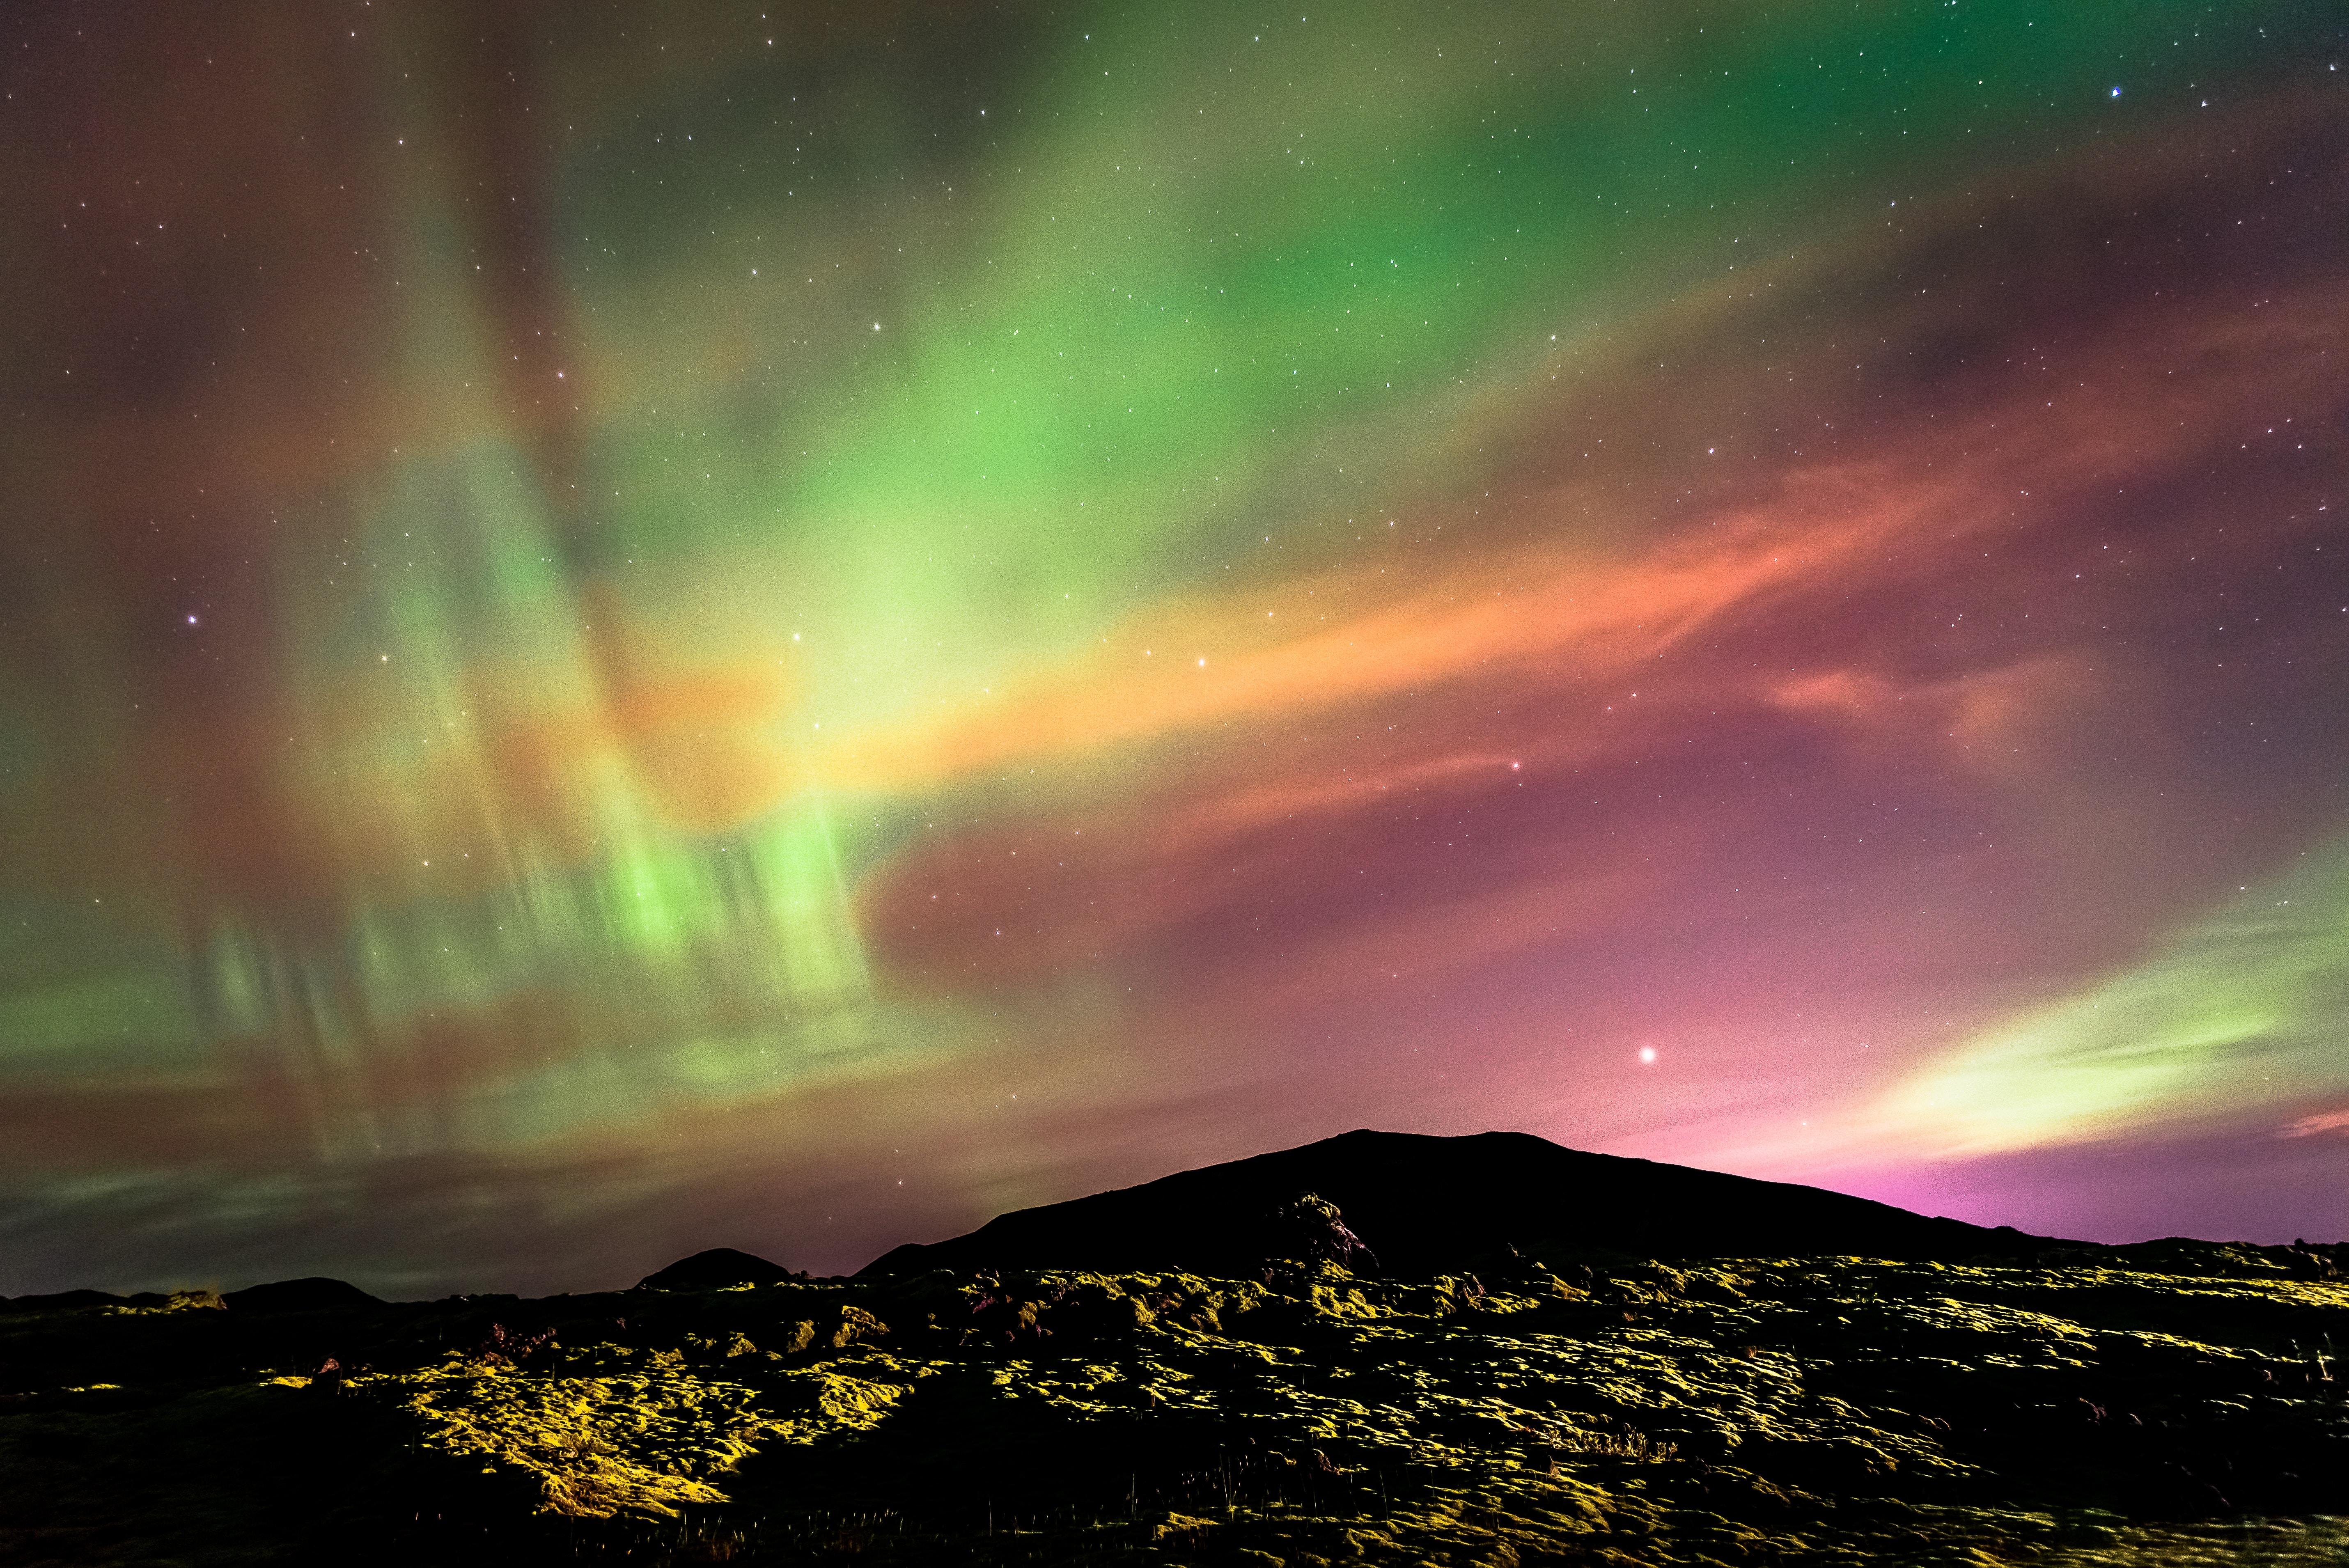 silhouette of mountain during aurora borealis long exposure photography